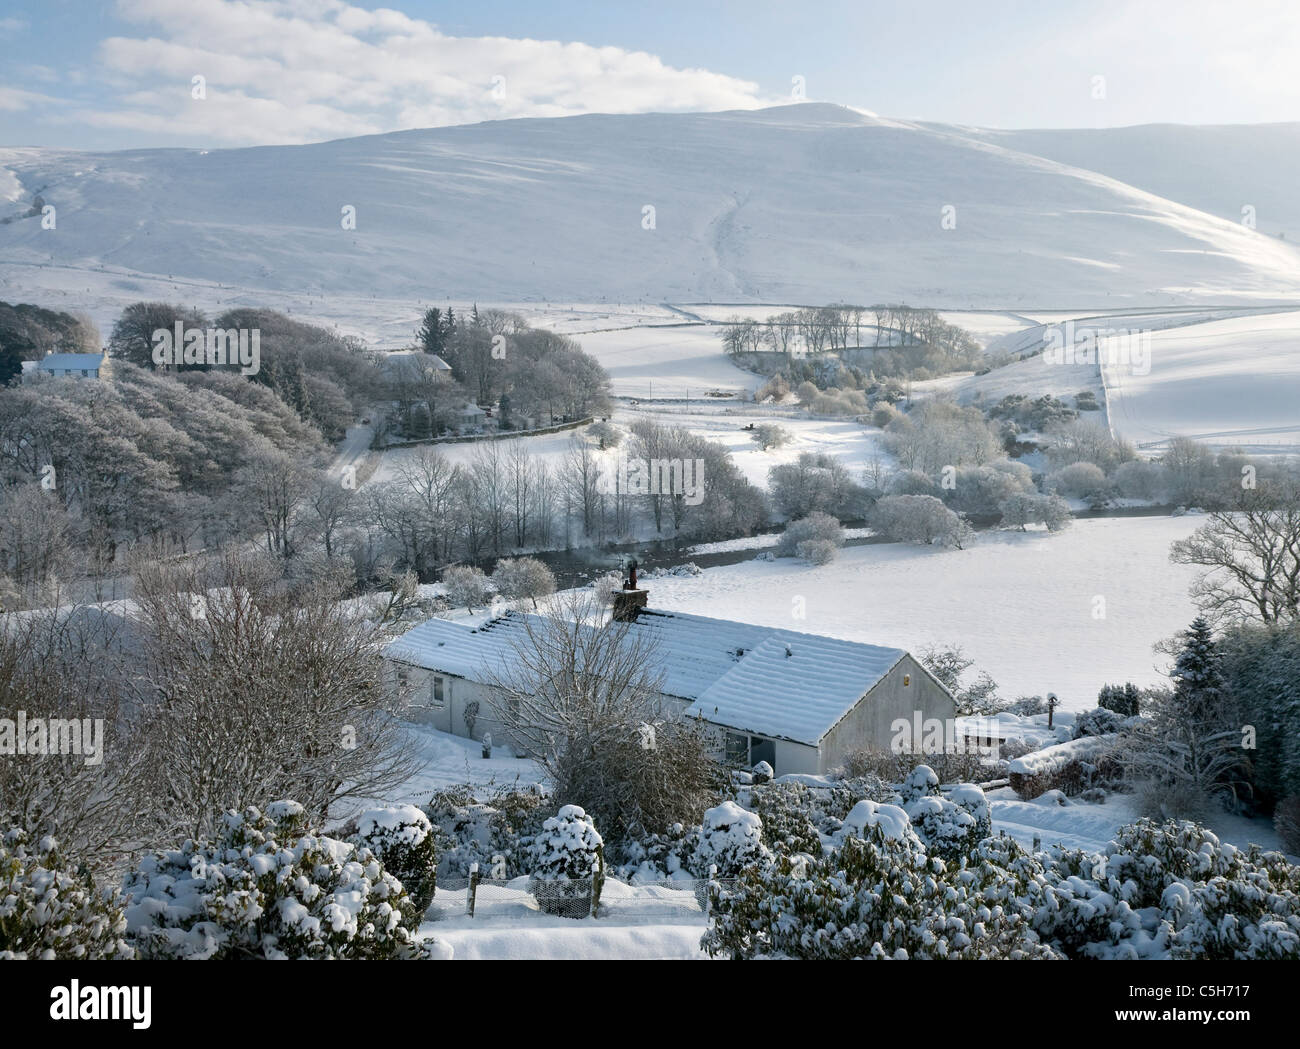 Yarrow agua en pleno invierno - Scottish Borders Imagen De Stock